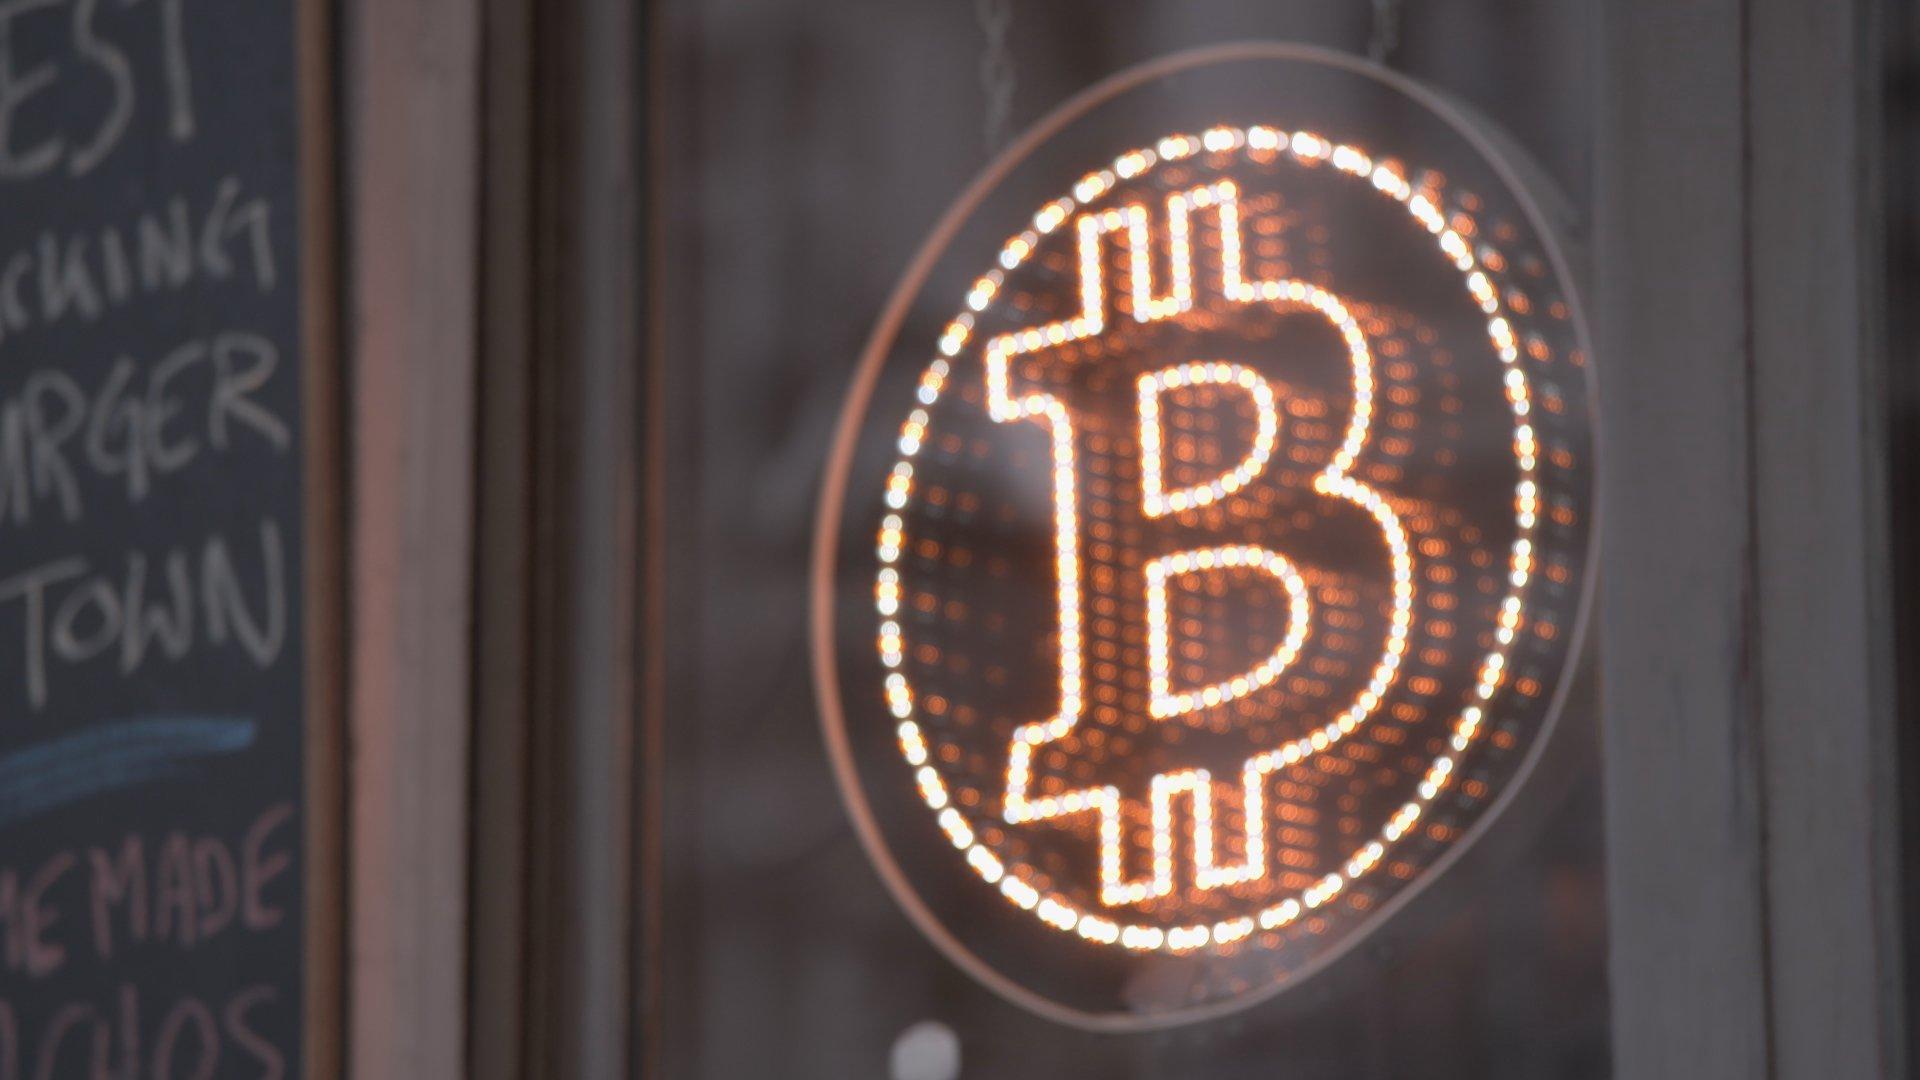 Die Bitcoin-Millionäre – Mit vollem Einsatz ins Risiko (Doku)